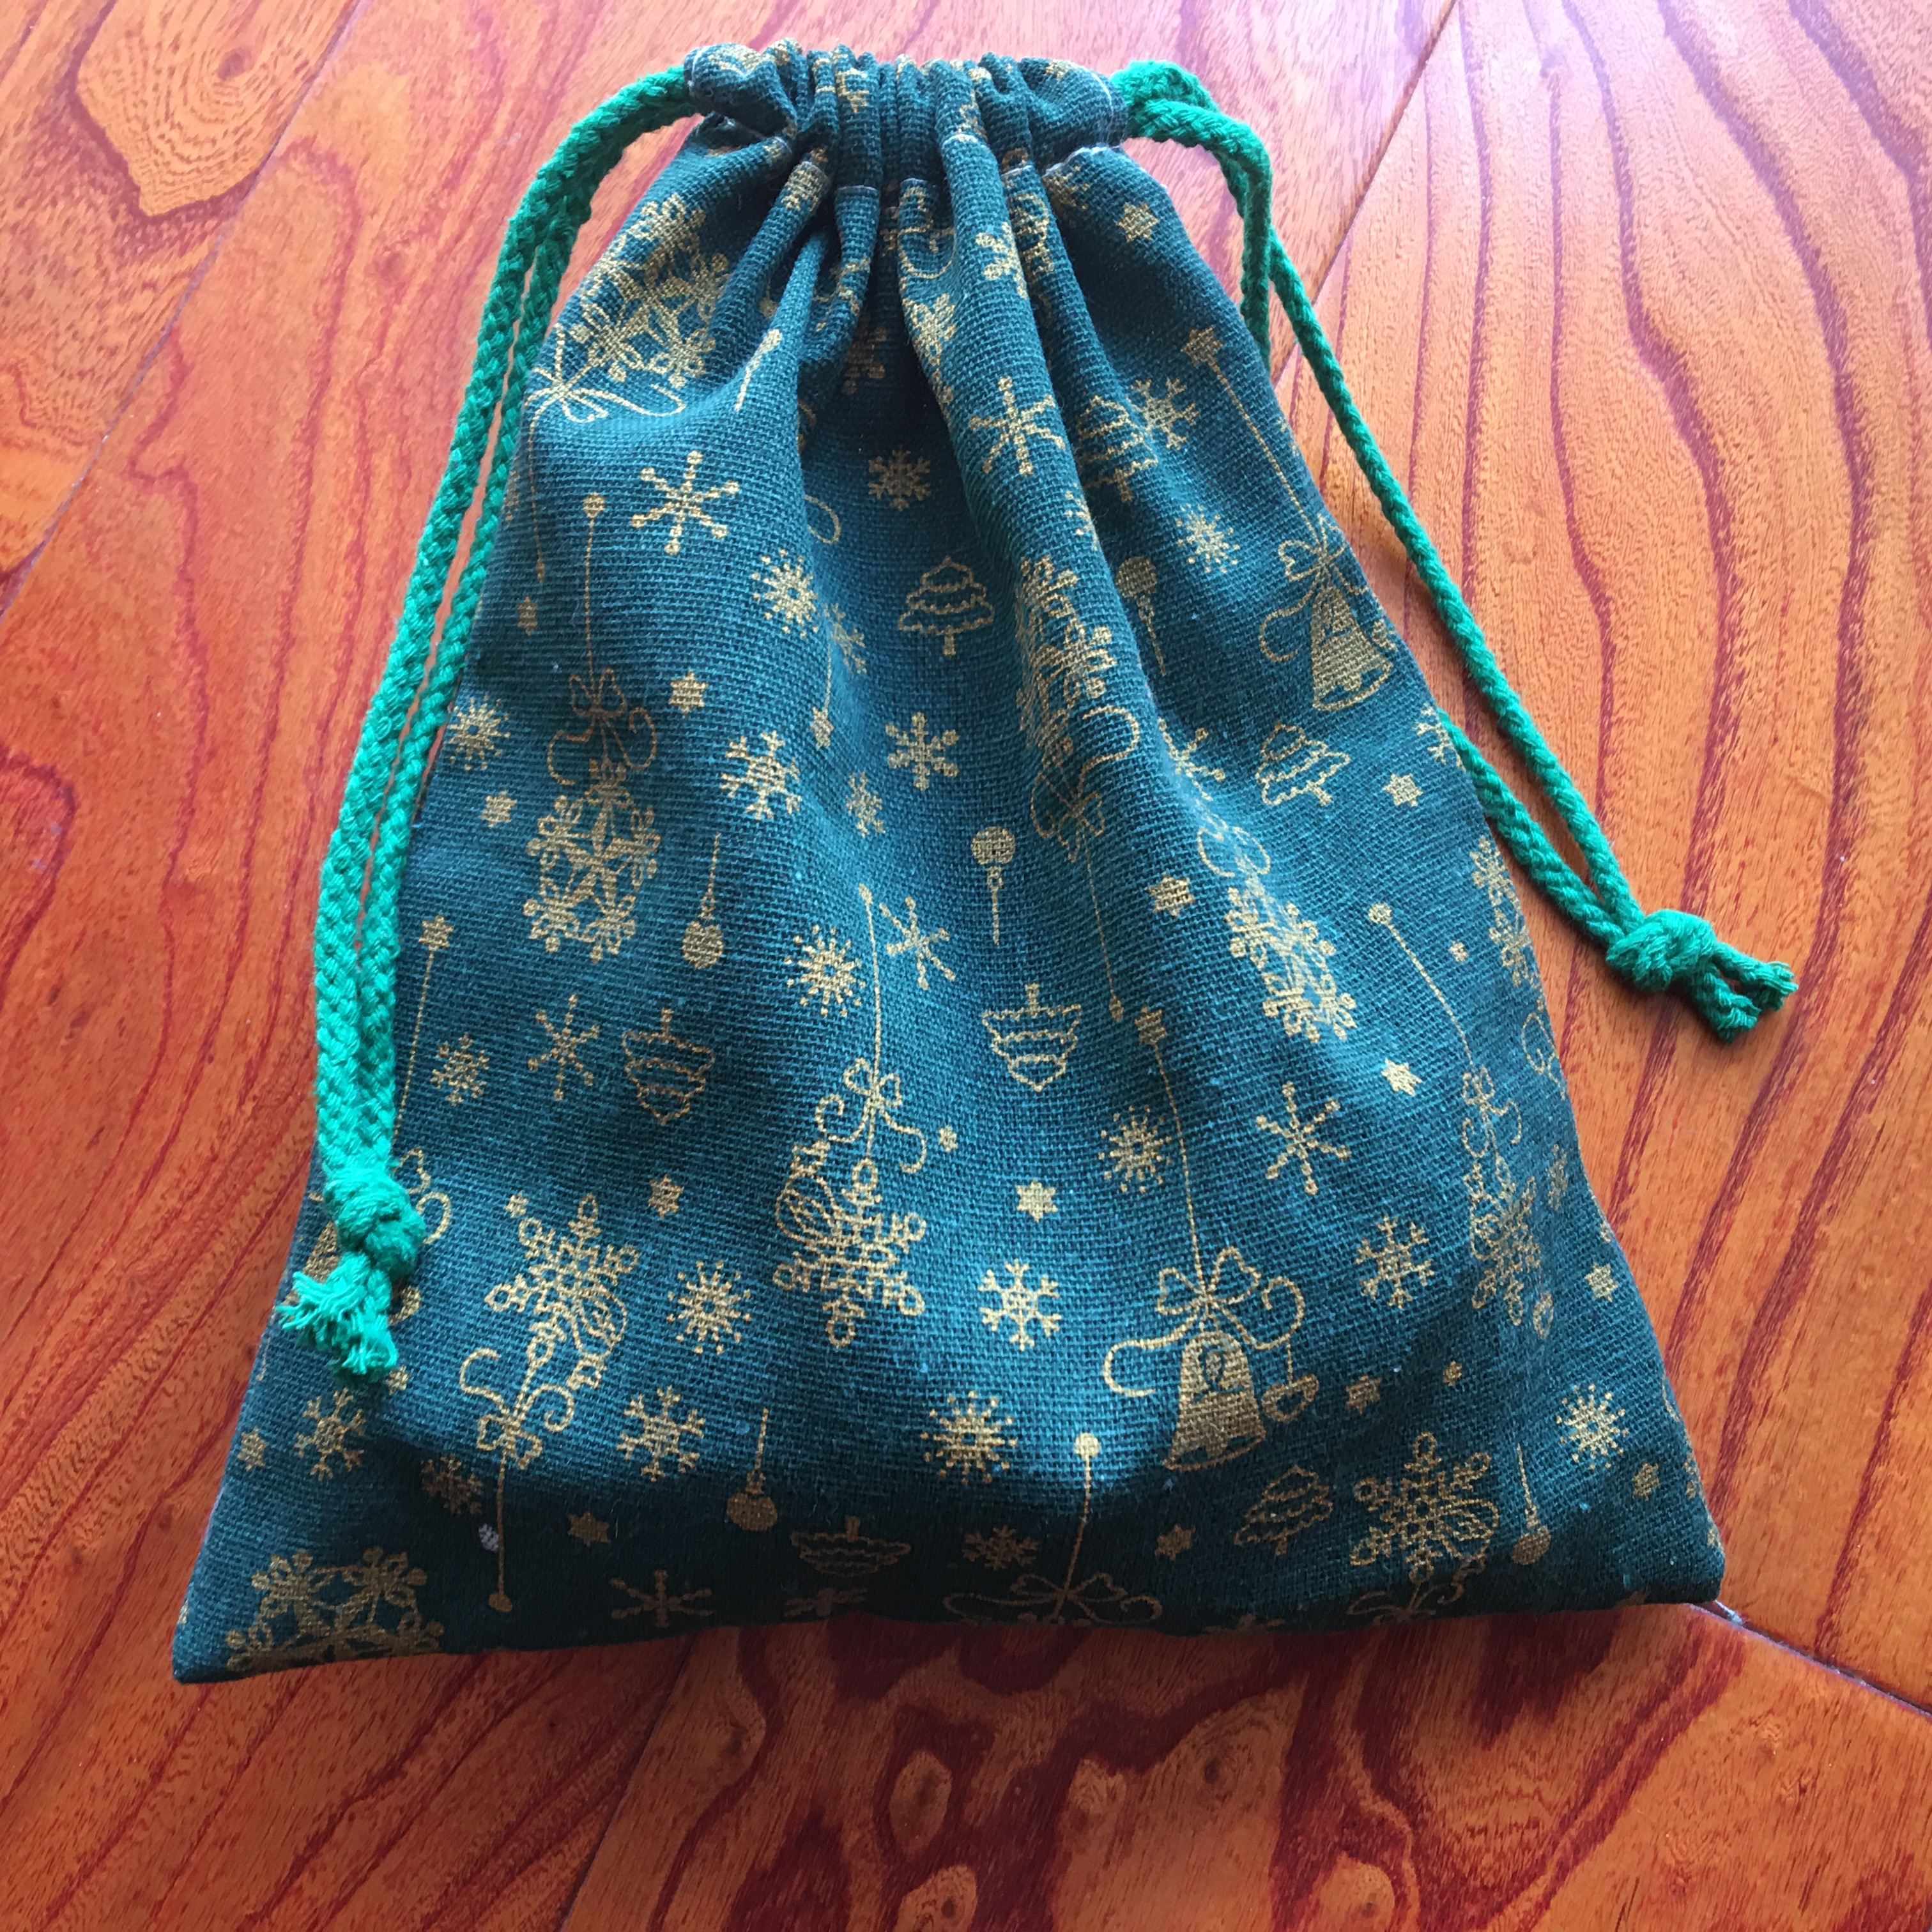 1pc Cotton Linen Drawstring Pouch Multi-purpose Bag Golden Christmas Bell Snowflake Green Party Gift Bag YILE